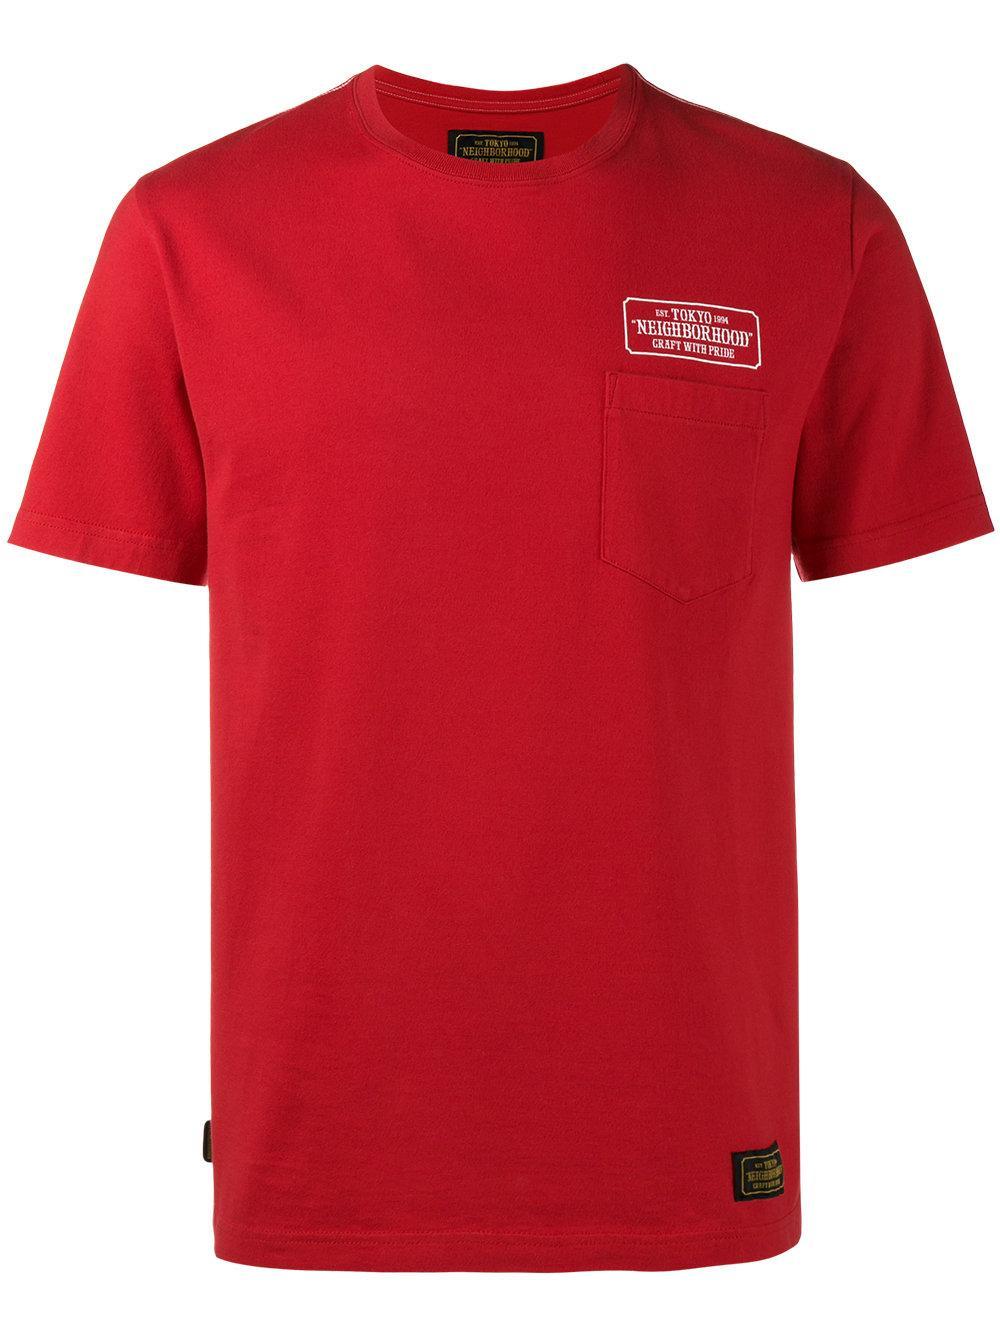 red dirt shirt washing instructions